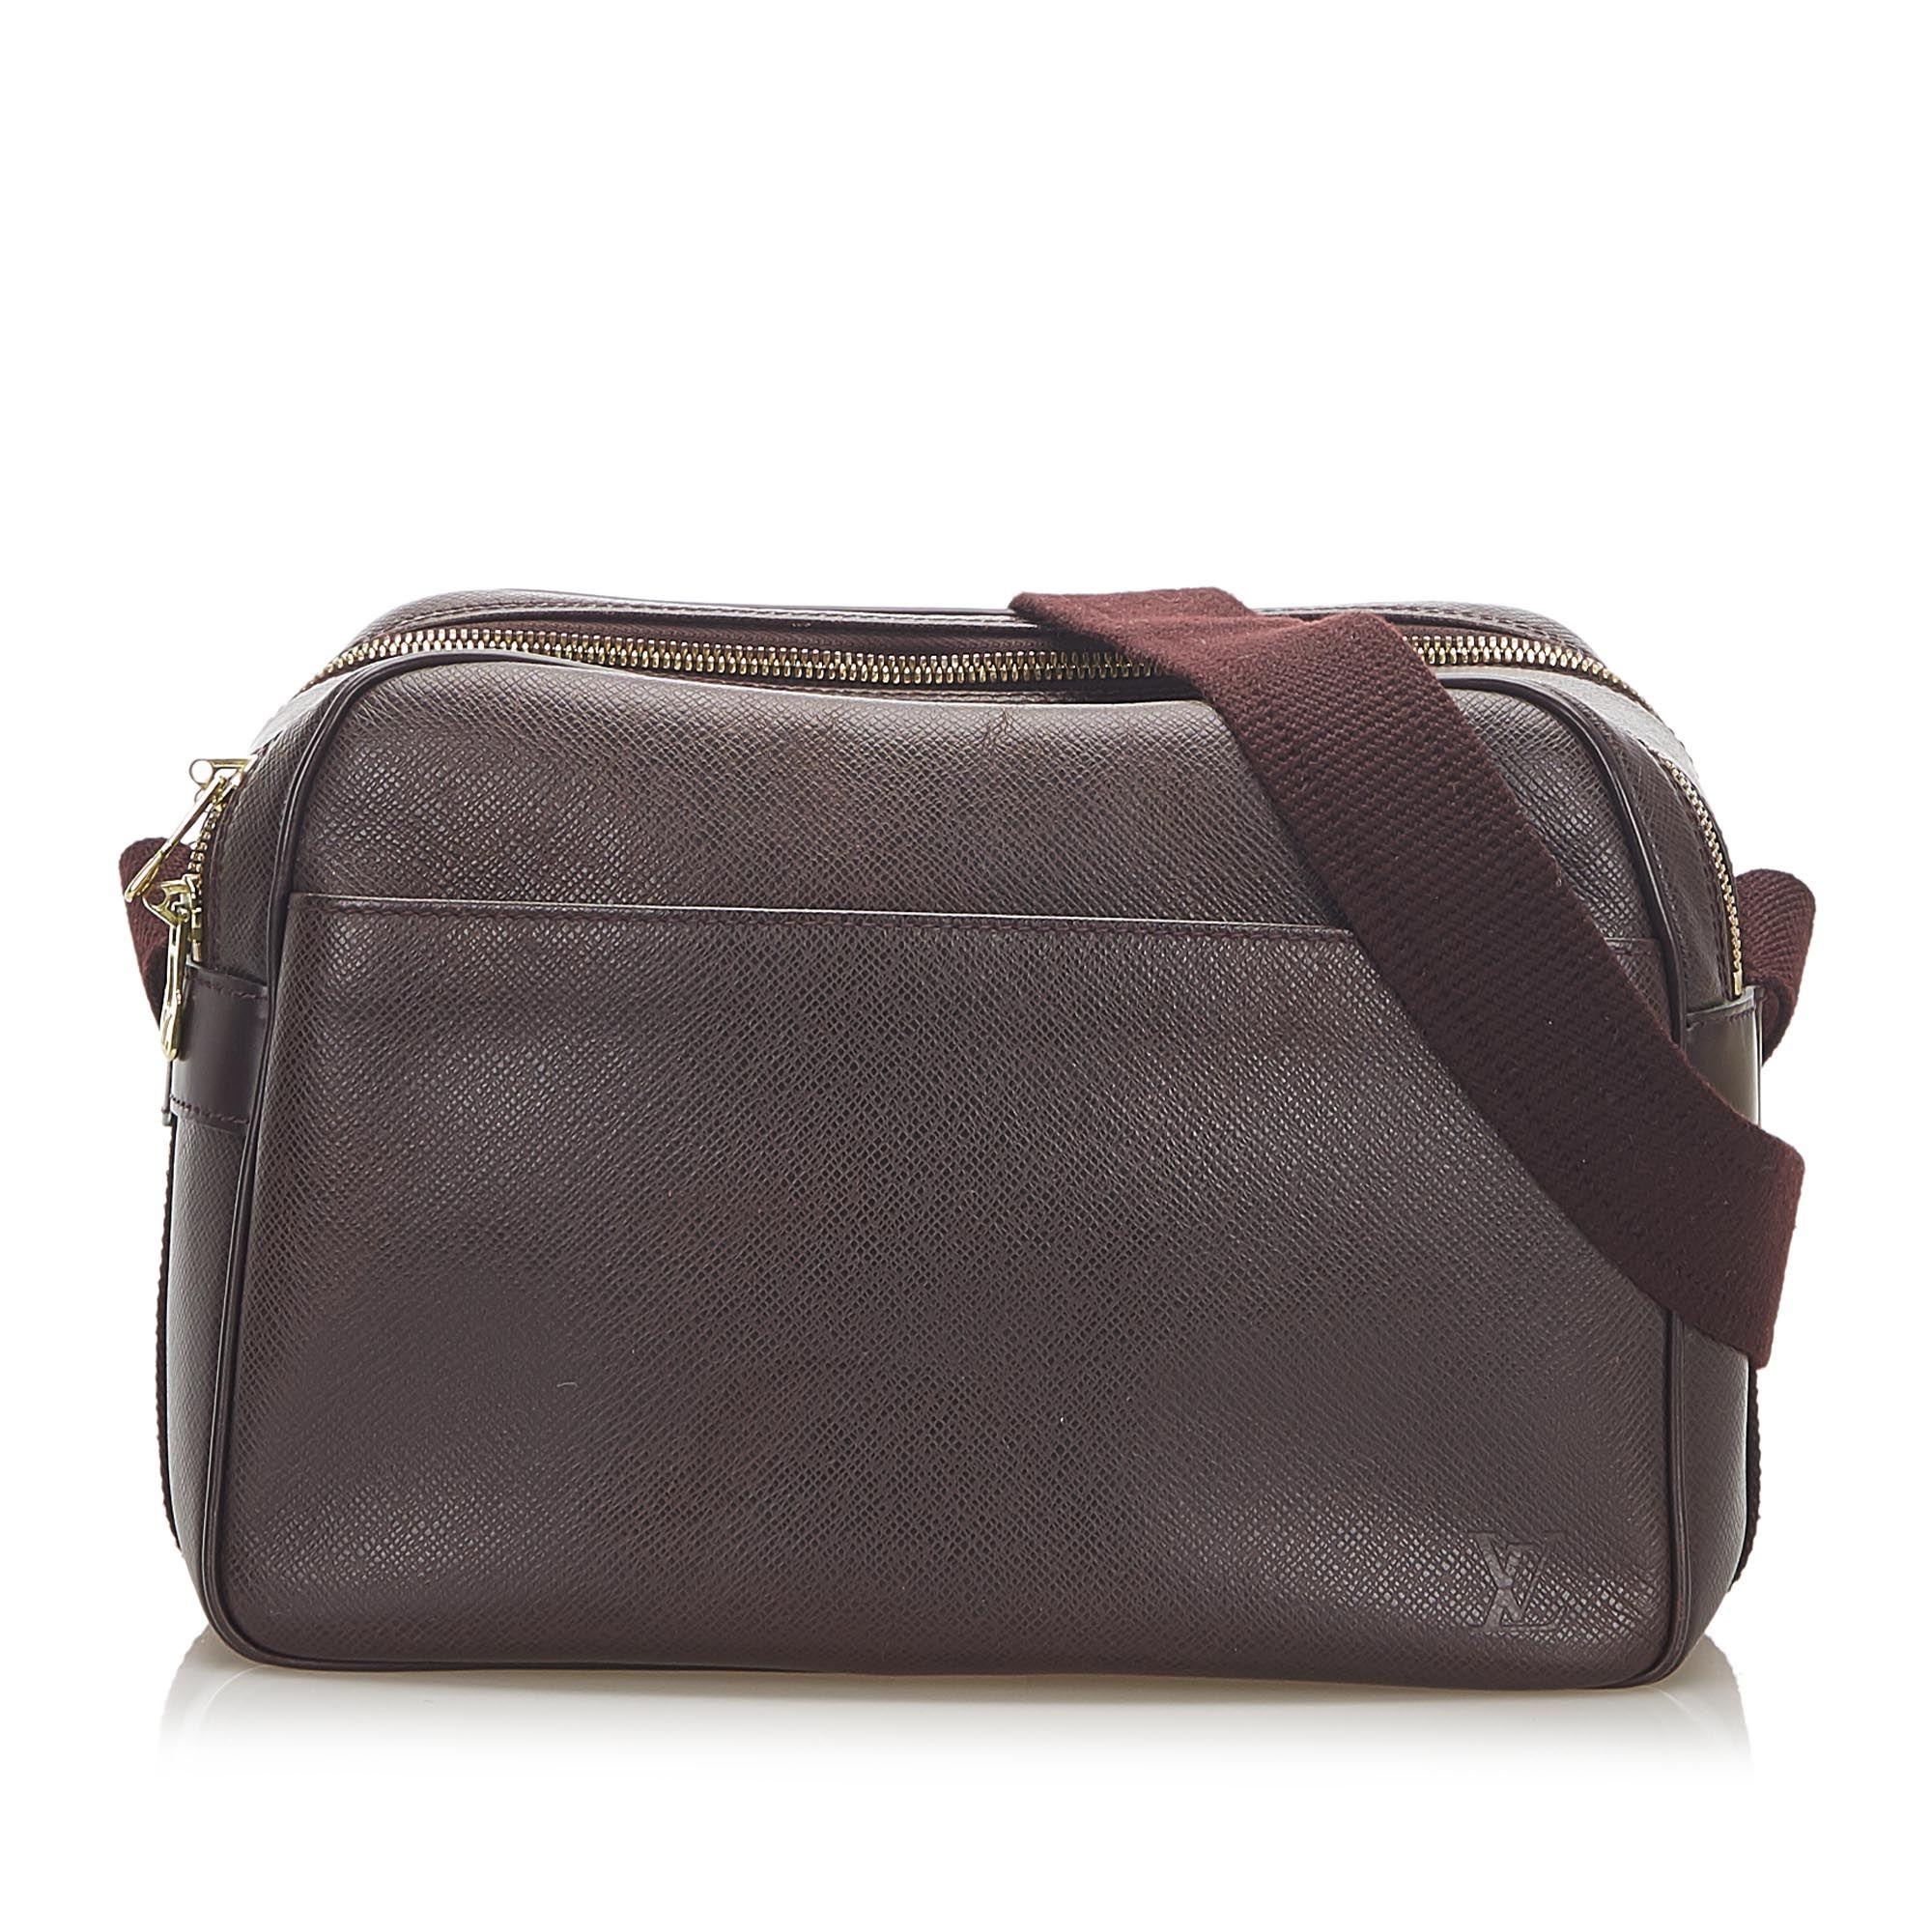 Vintage Louis Vuitton Taiga Reporter PM Brown